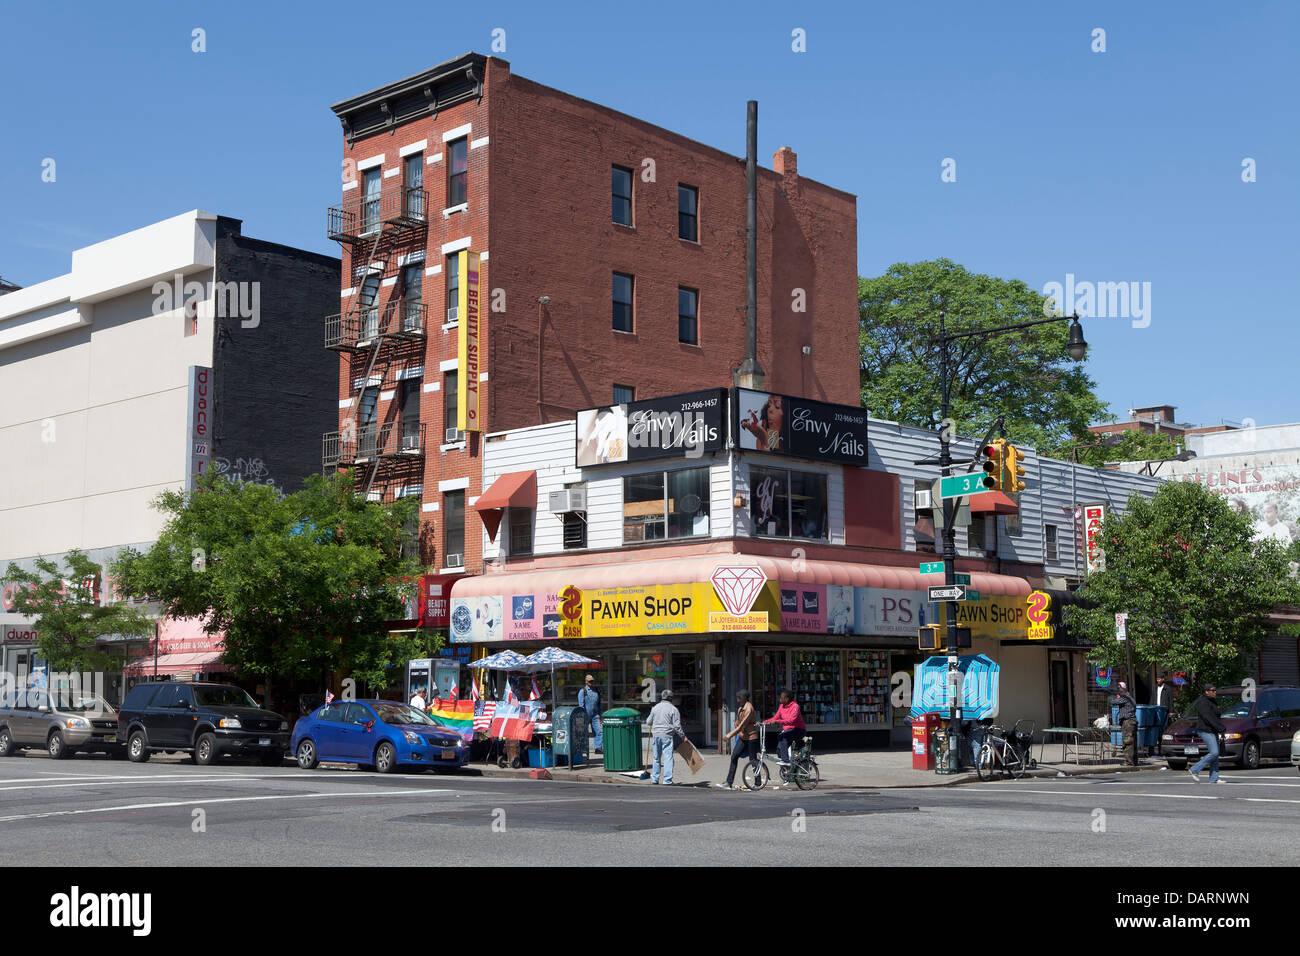 Pawn shop at 3rd Av, New York City - Stock Image